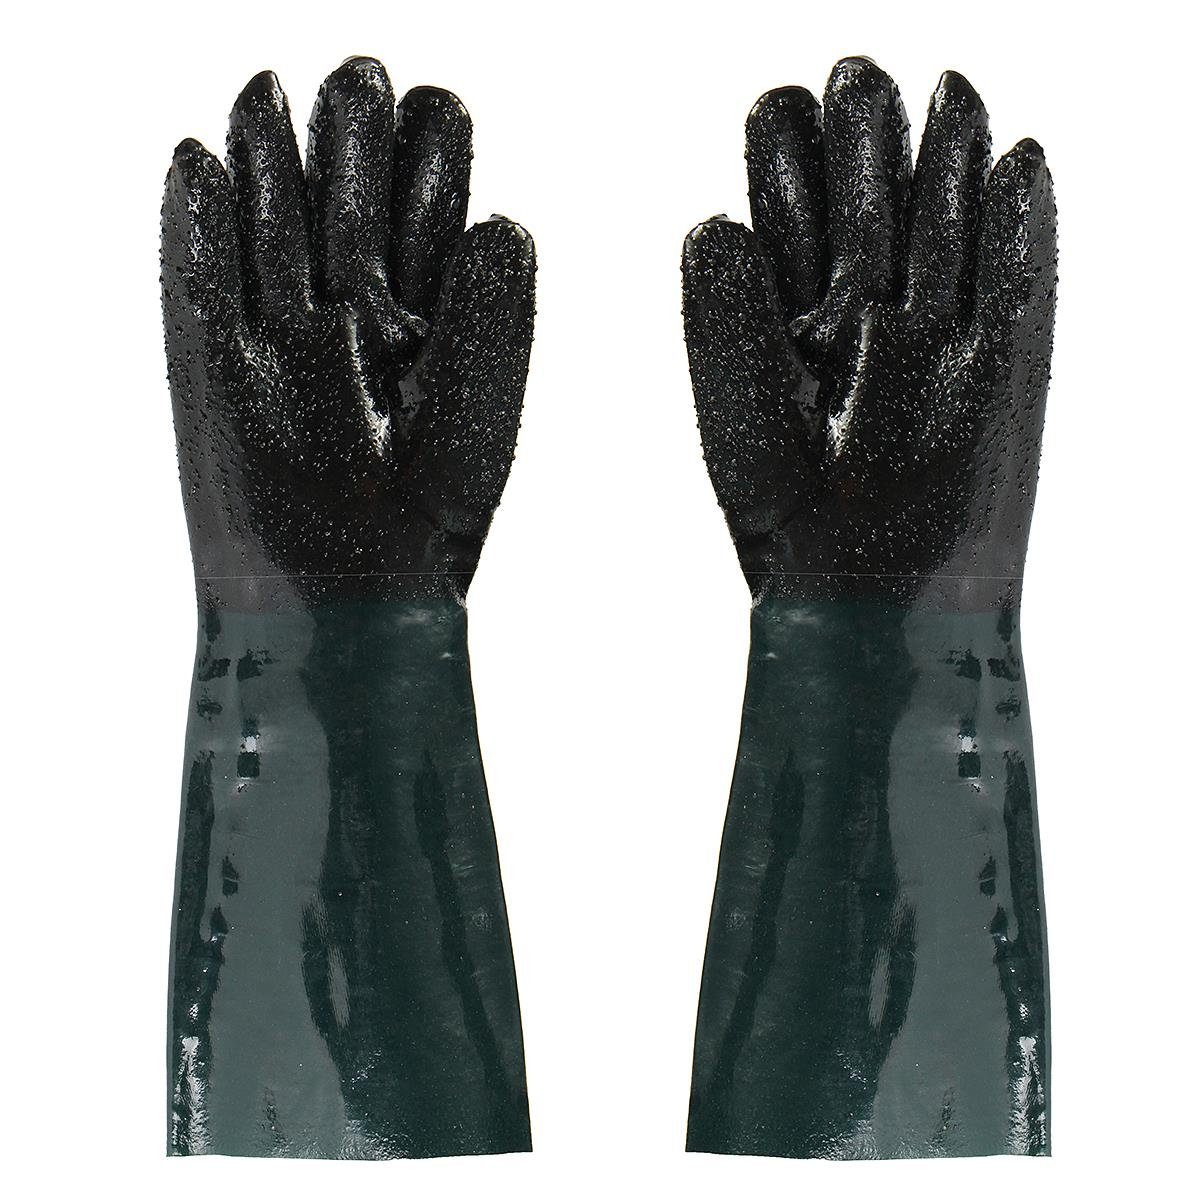 NEW 48CM Rubber Sandblaster Sand Blaster Sandblasting Gloves For Sandblast Cabinets Safety Glove pvc sandblaster gloves 60cm